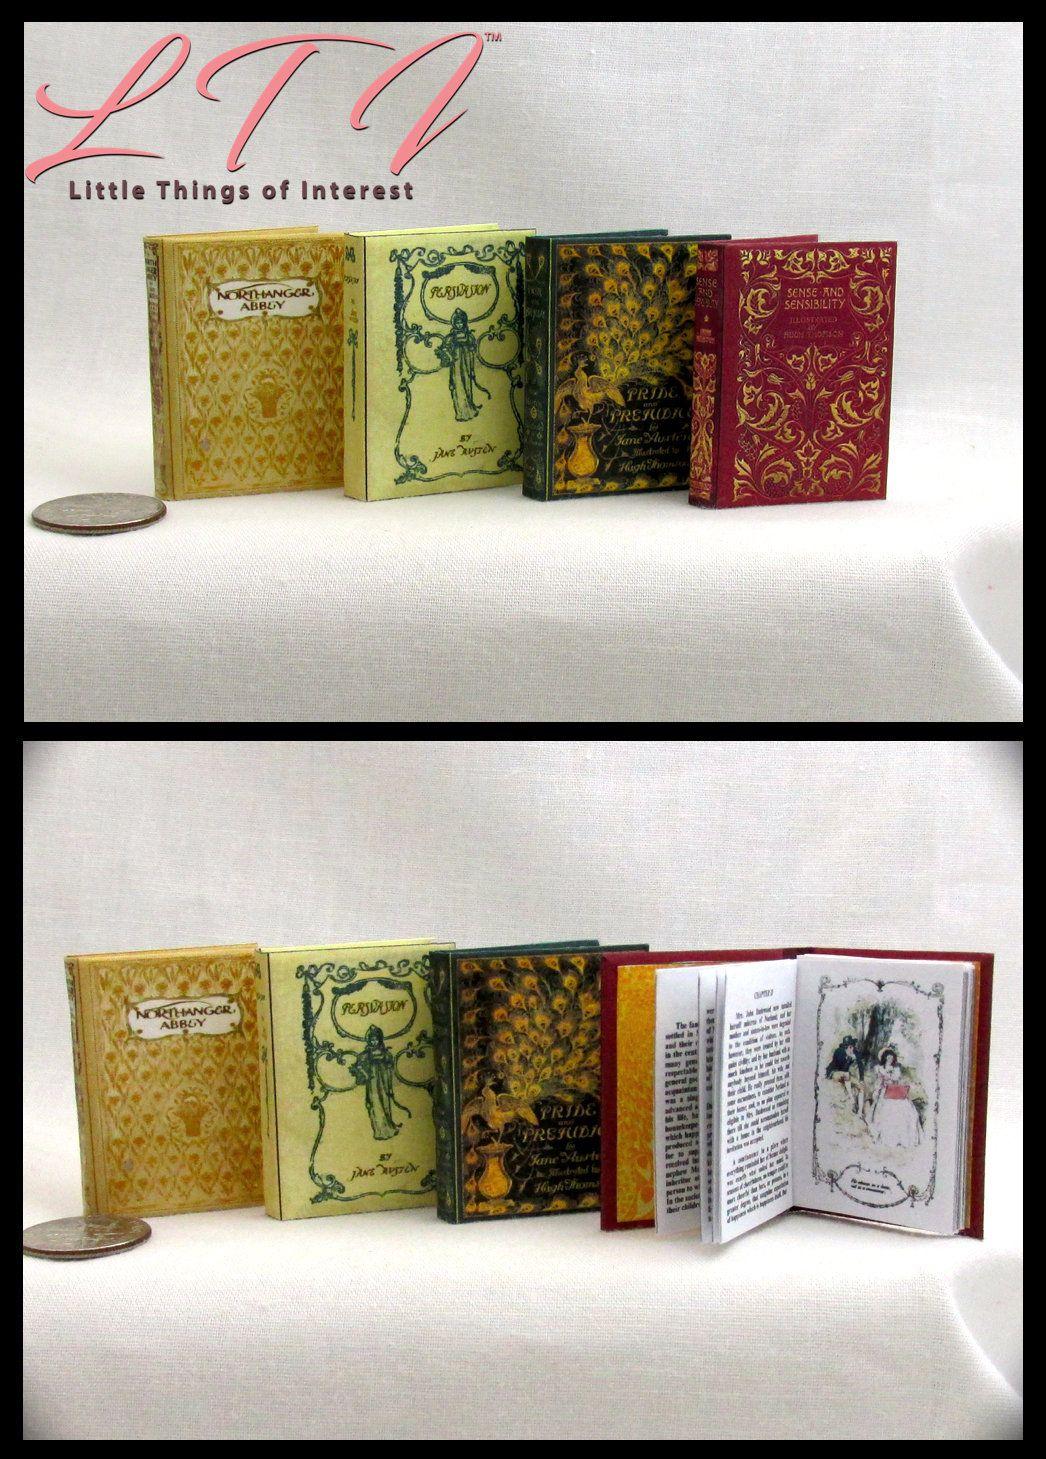 1:6 SCALE MINIATURE BOOK PRIDE AND PREJUDICE ILLUSTRATED JANE AUSTEN PLAYSCALE